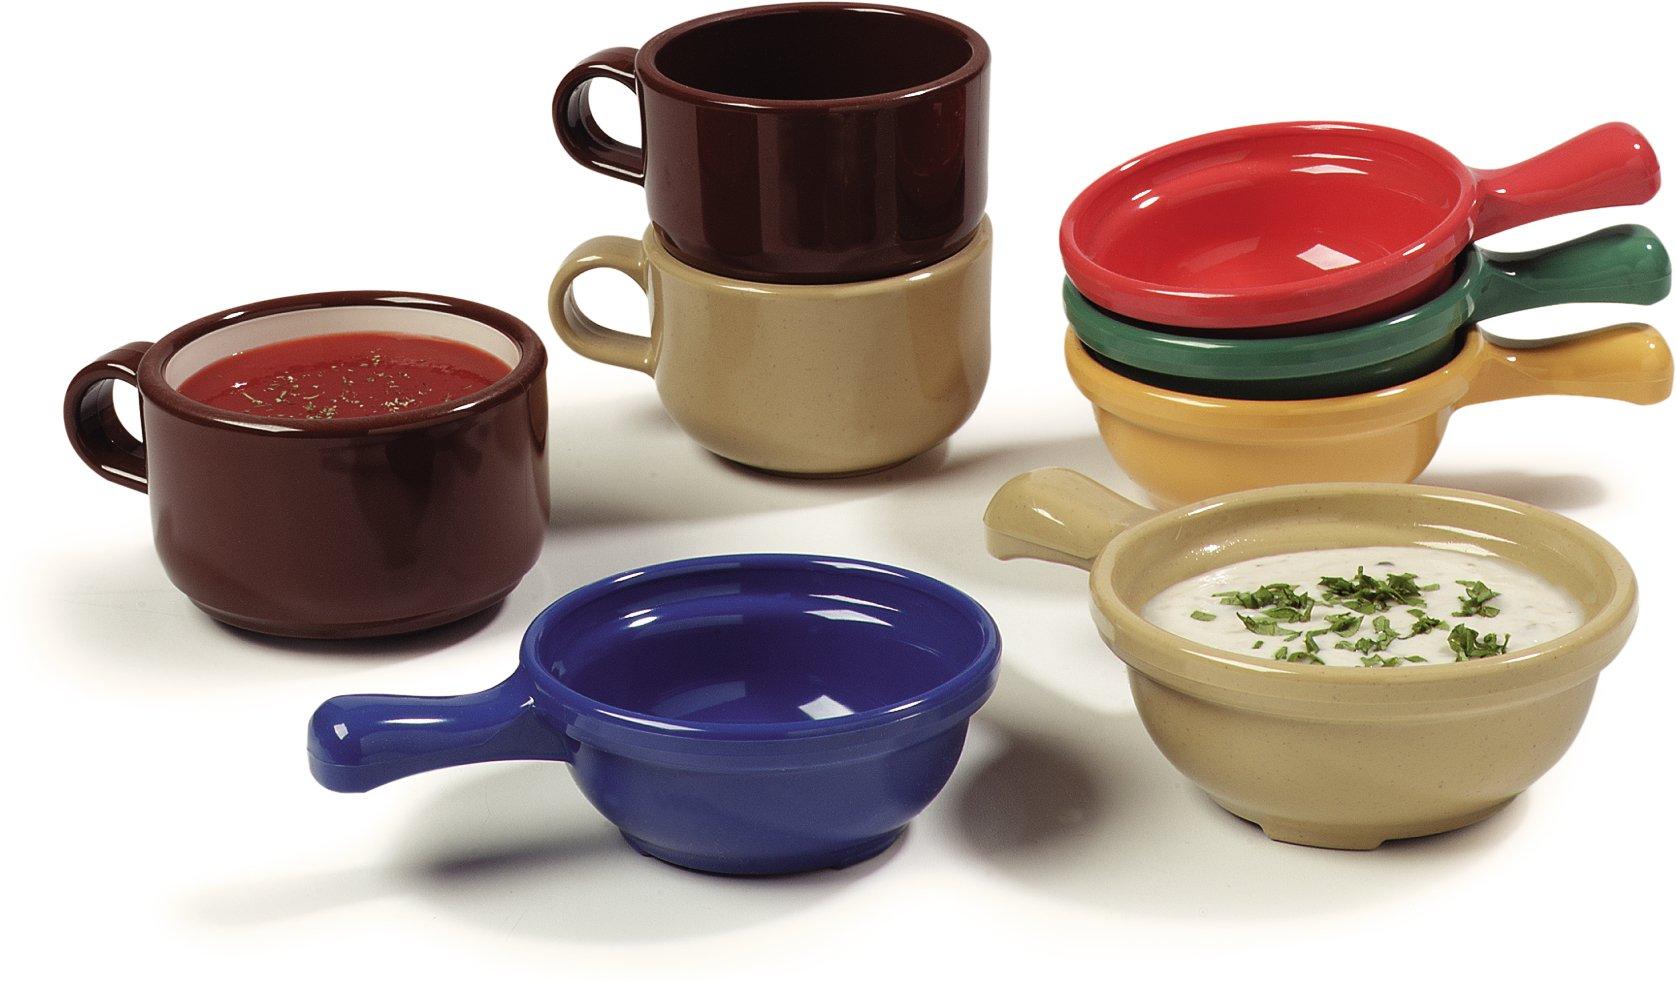 Carlisle 700614 Plastic Handled Soup Bowl, 8 oz., Ocean Blue (Pack of 24) by Carlisle (Image #7)